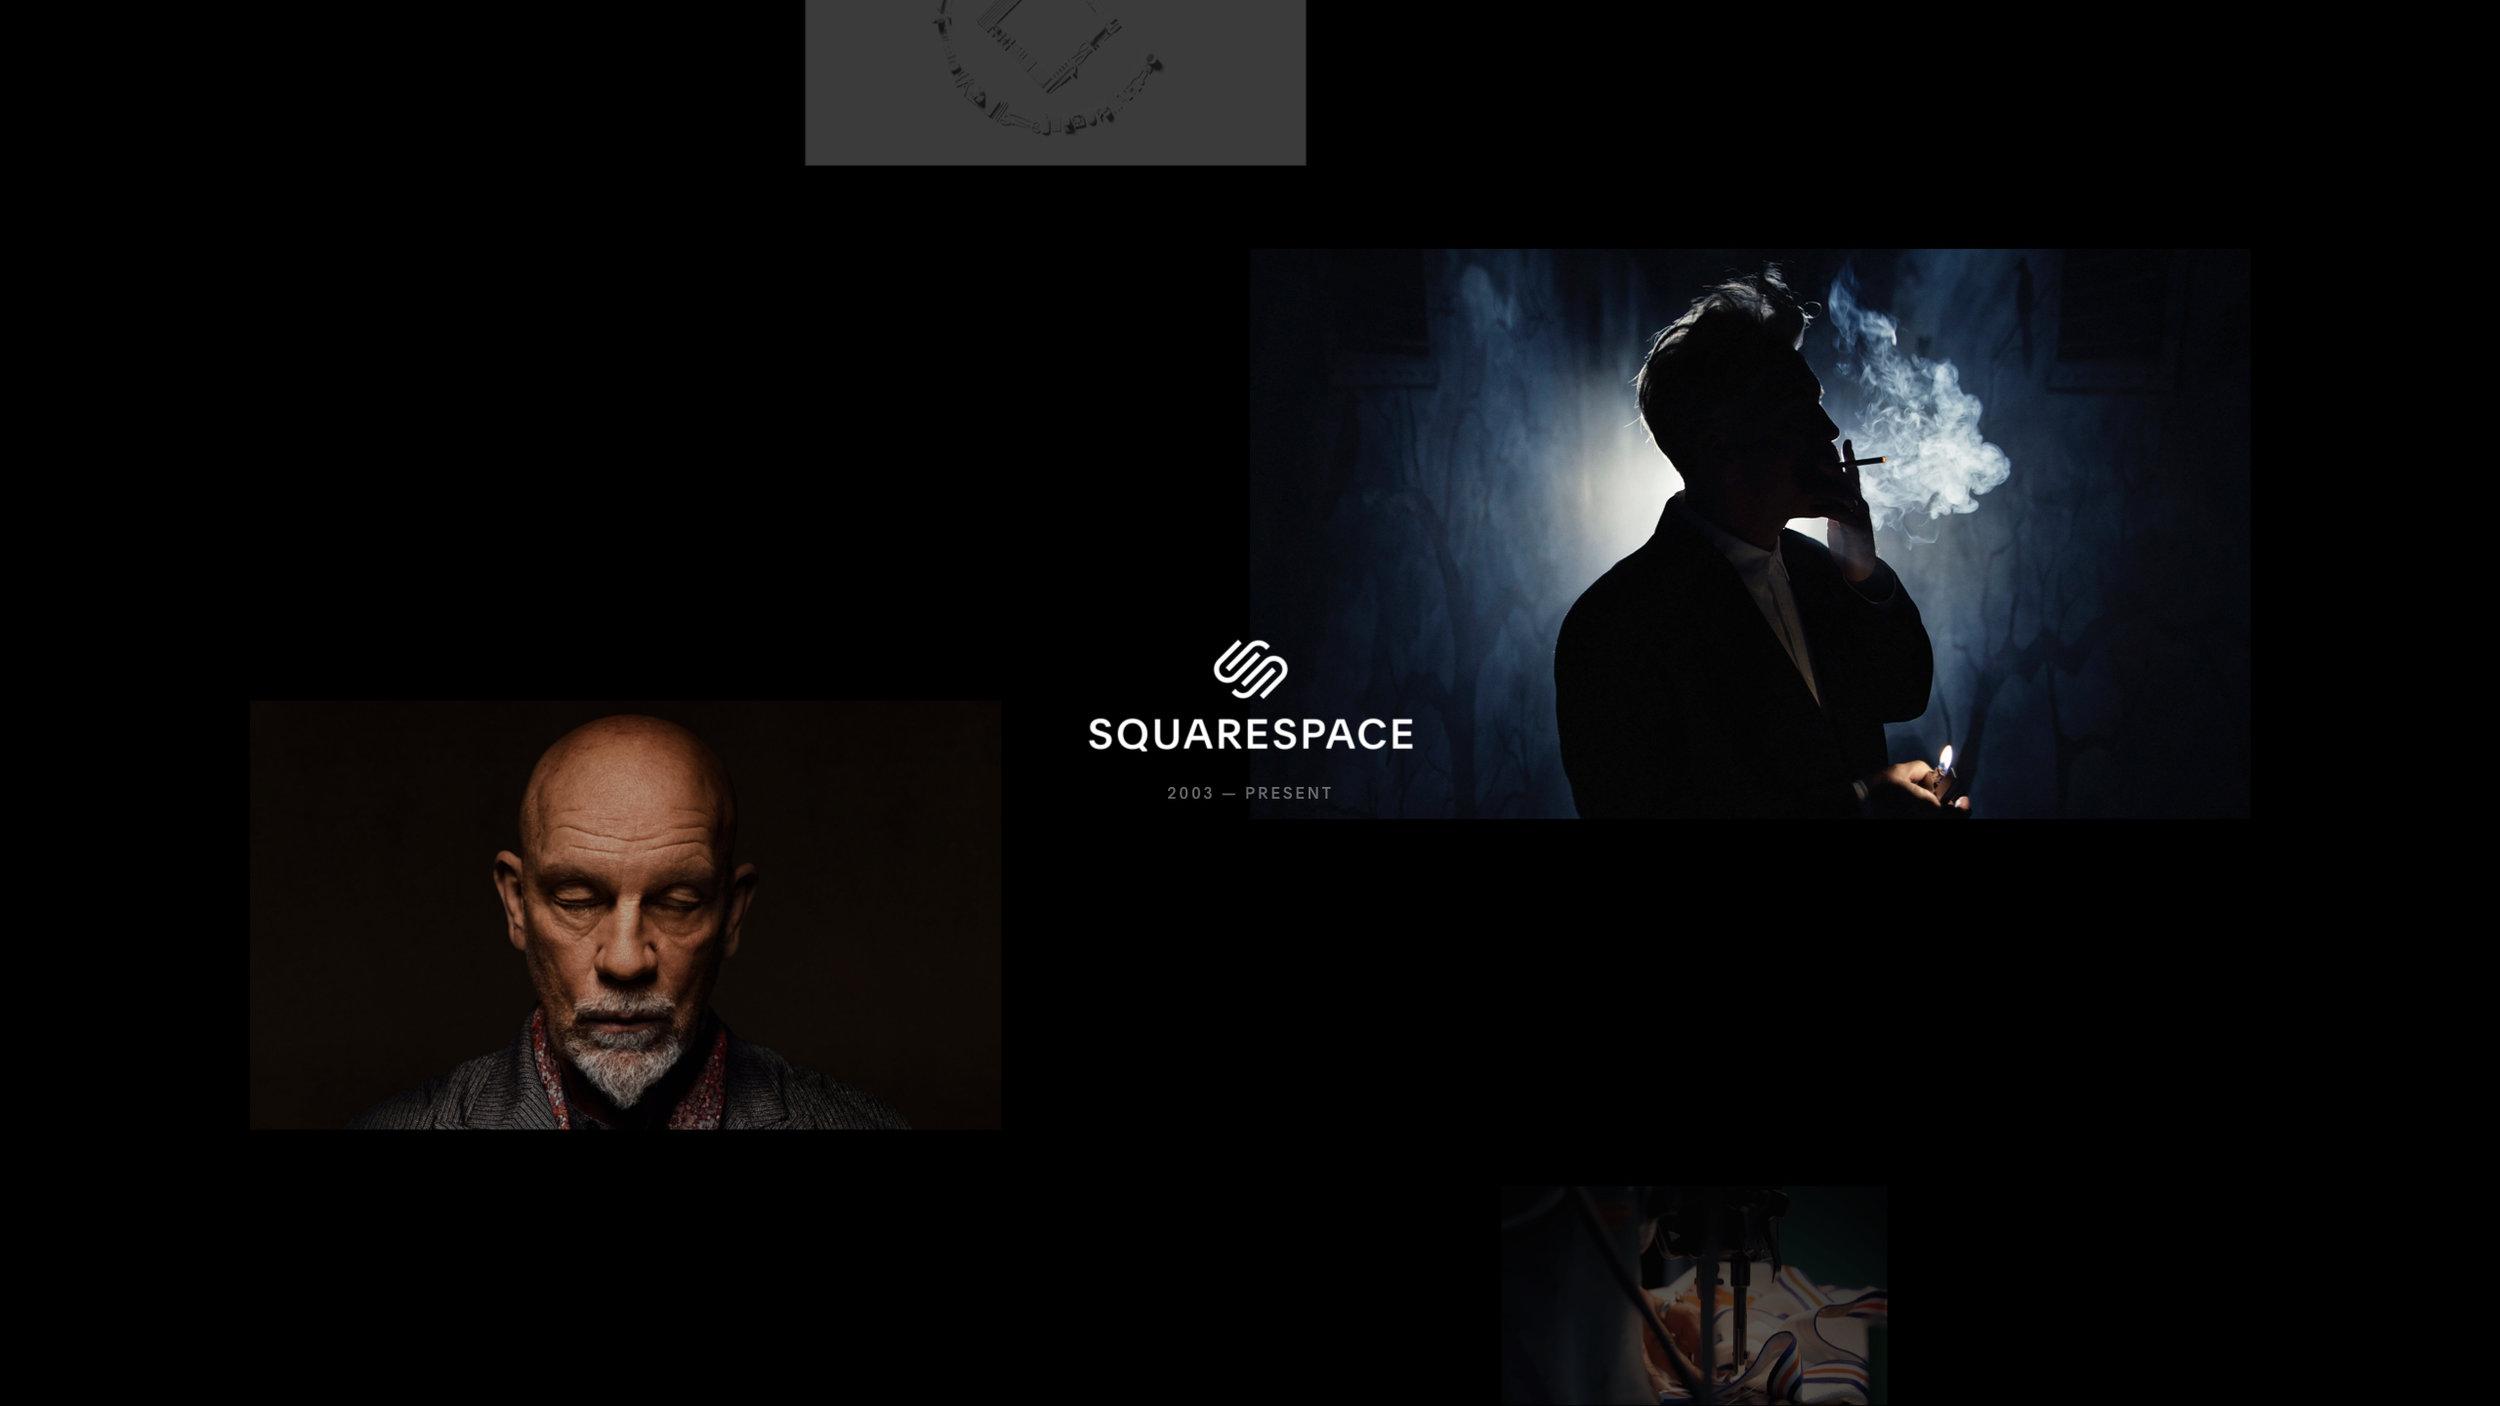 squarespace.com-timeline_00_Loading.jpg